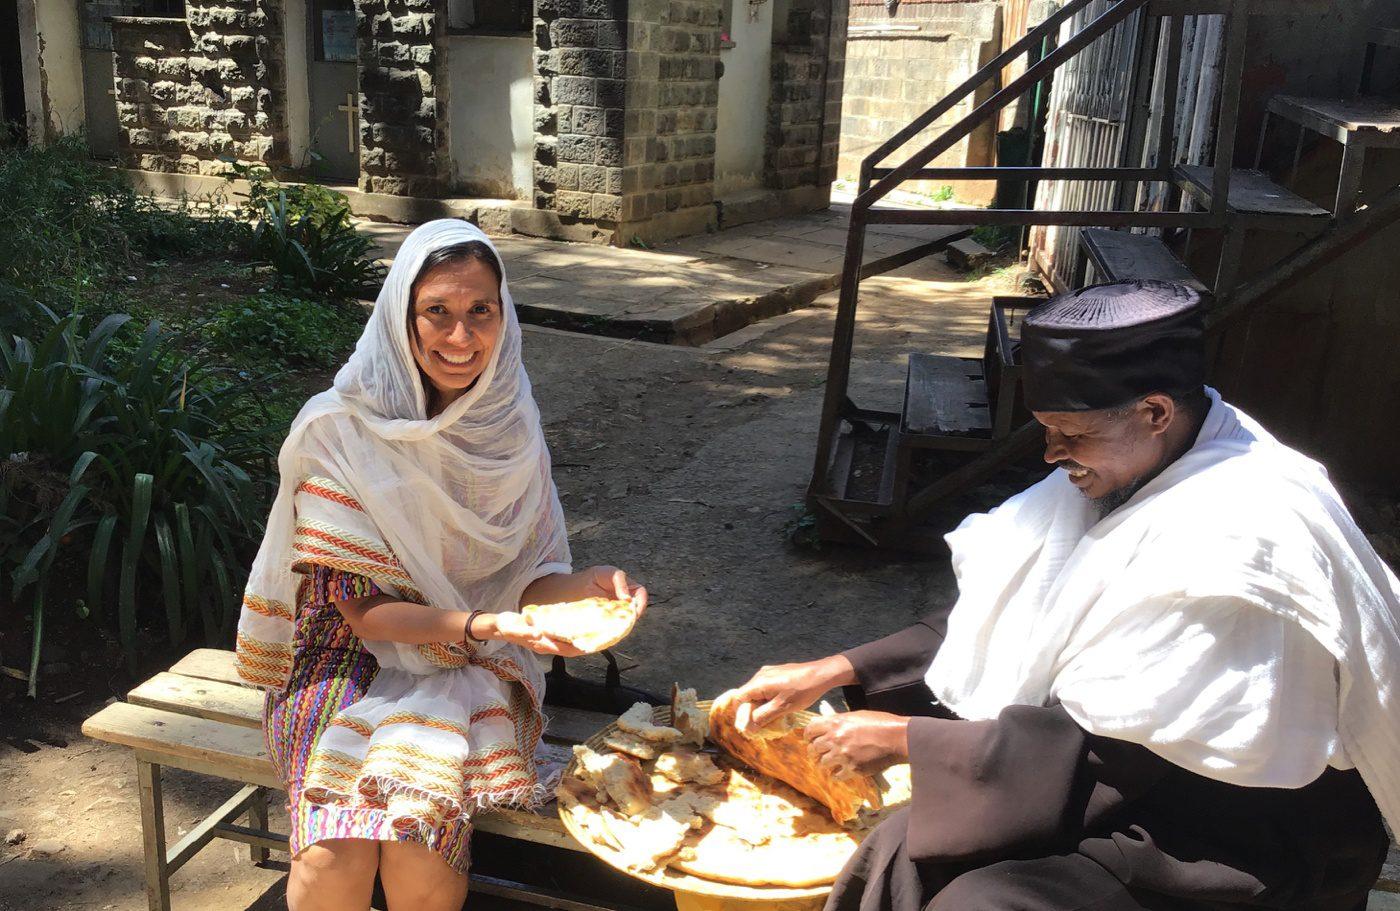 Humbasha bread in Addis Ababa, Ethiopia.